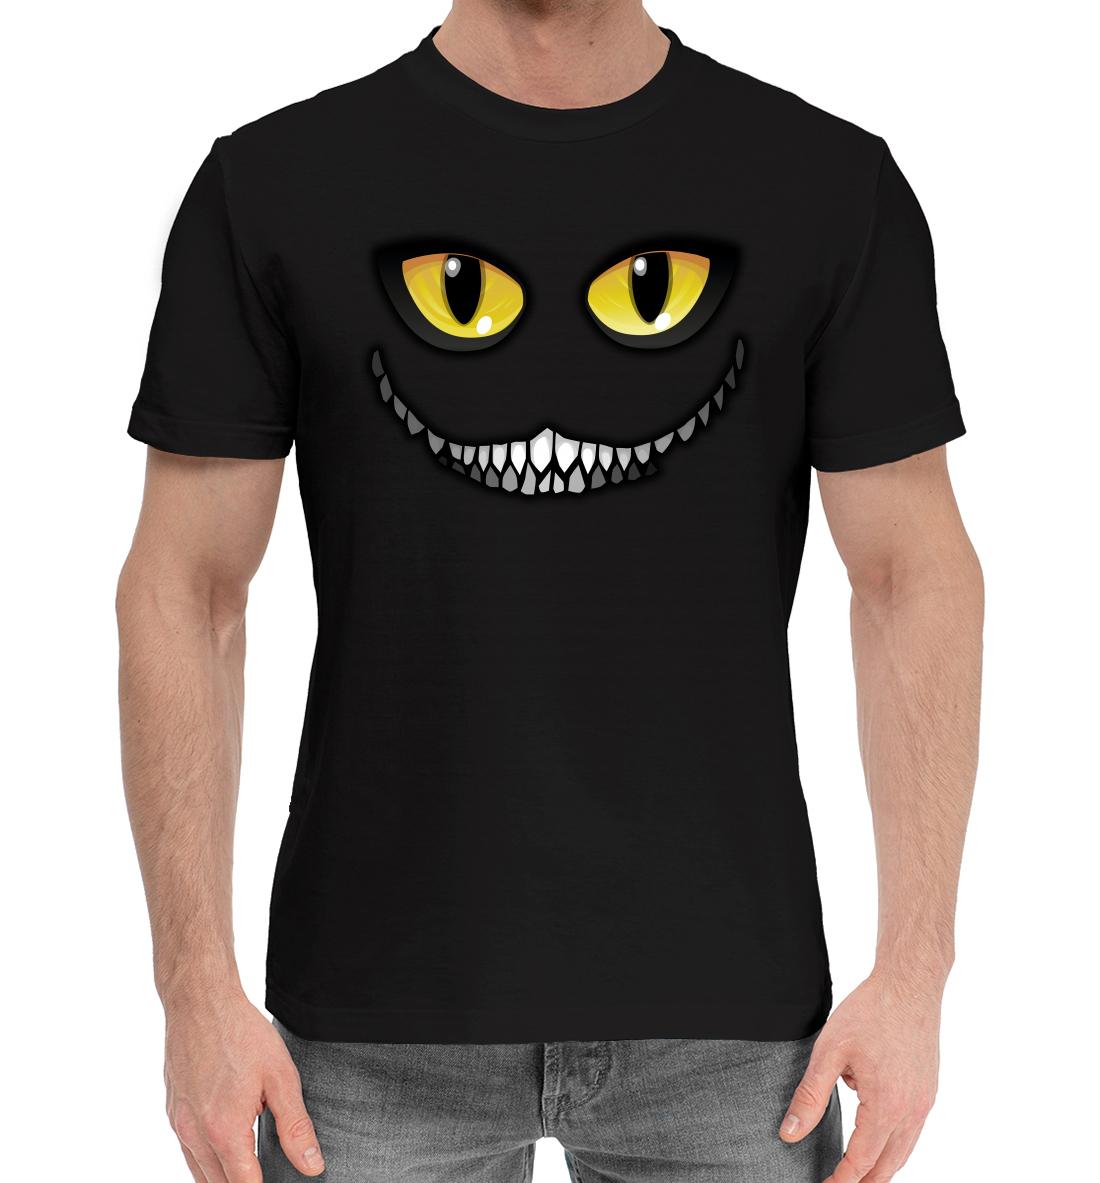 Фото - Чеширский кот чеширский кот на тёмно сером фоне